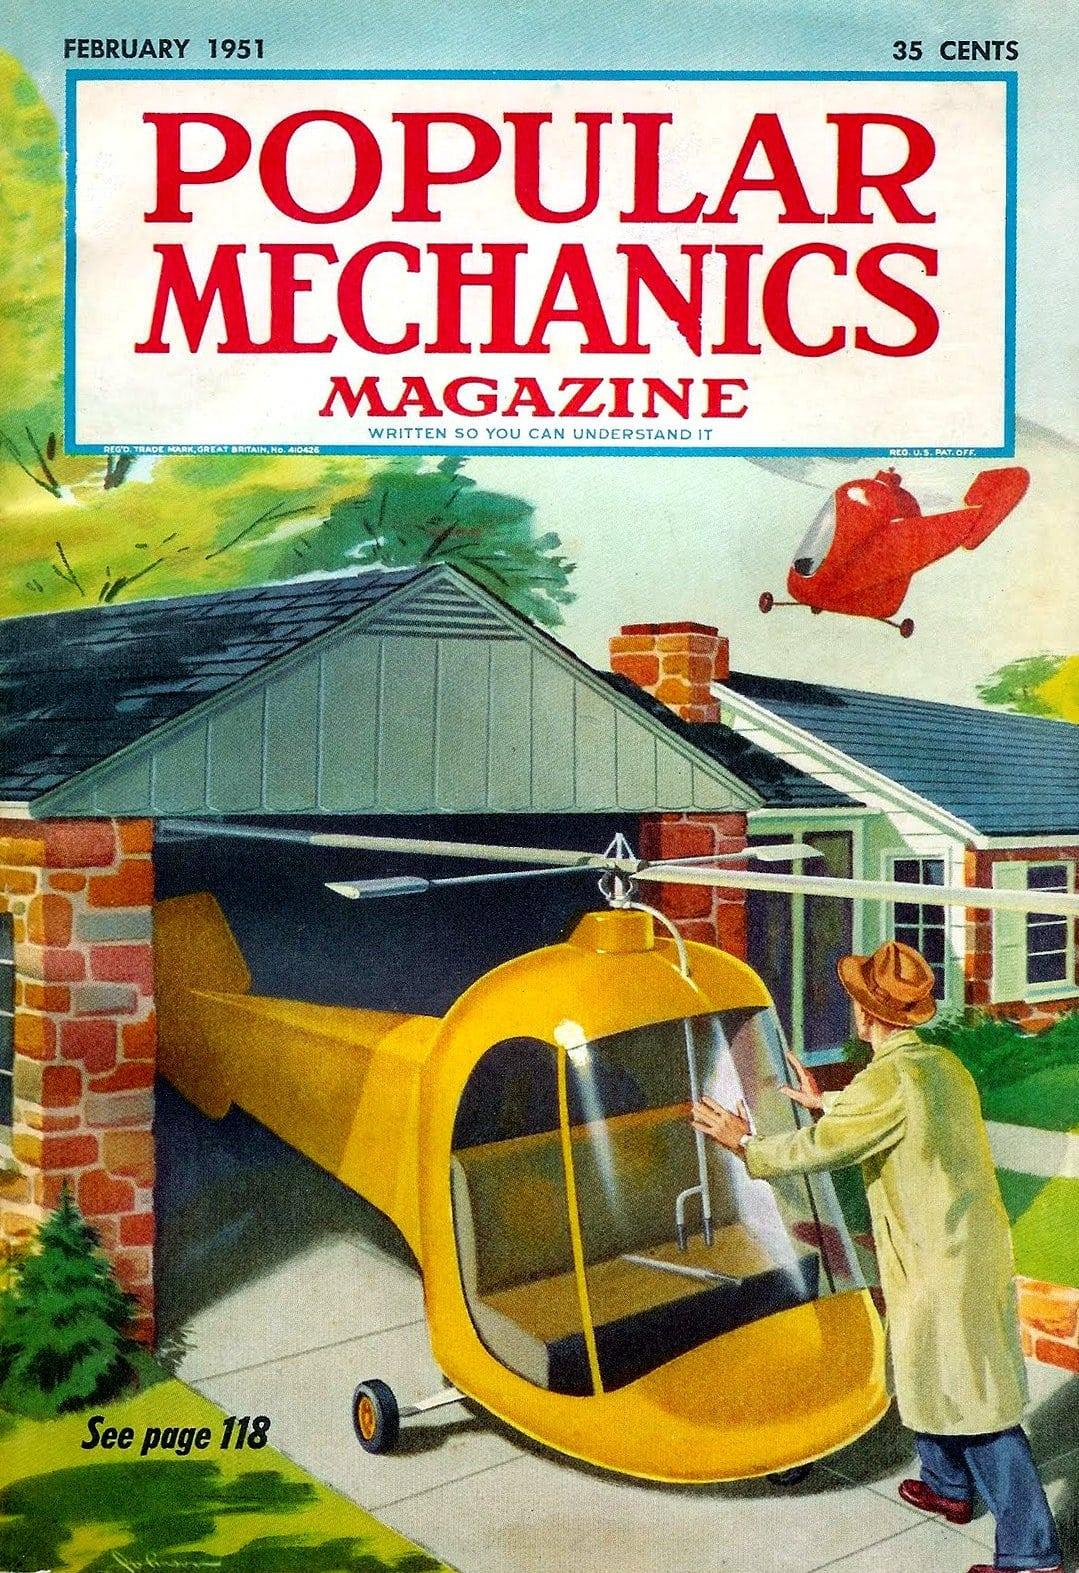 Vintage Popular Mechanics magazine cover - February 1951 - Futurism